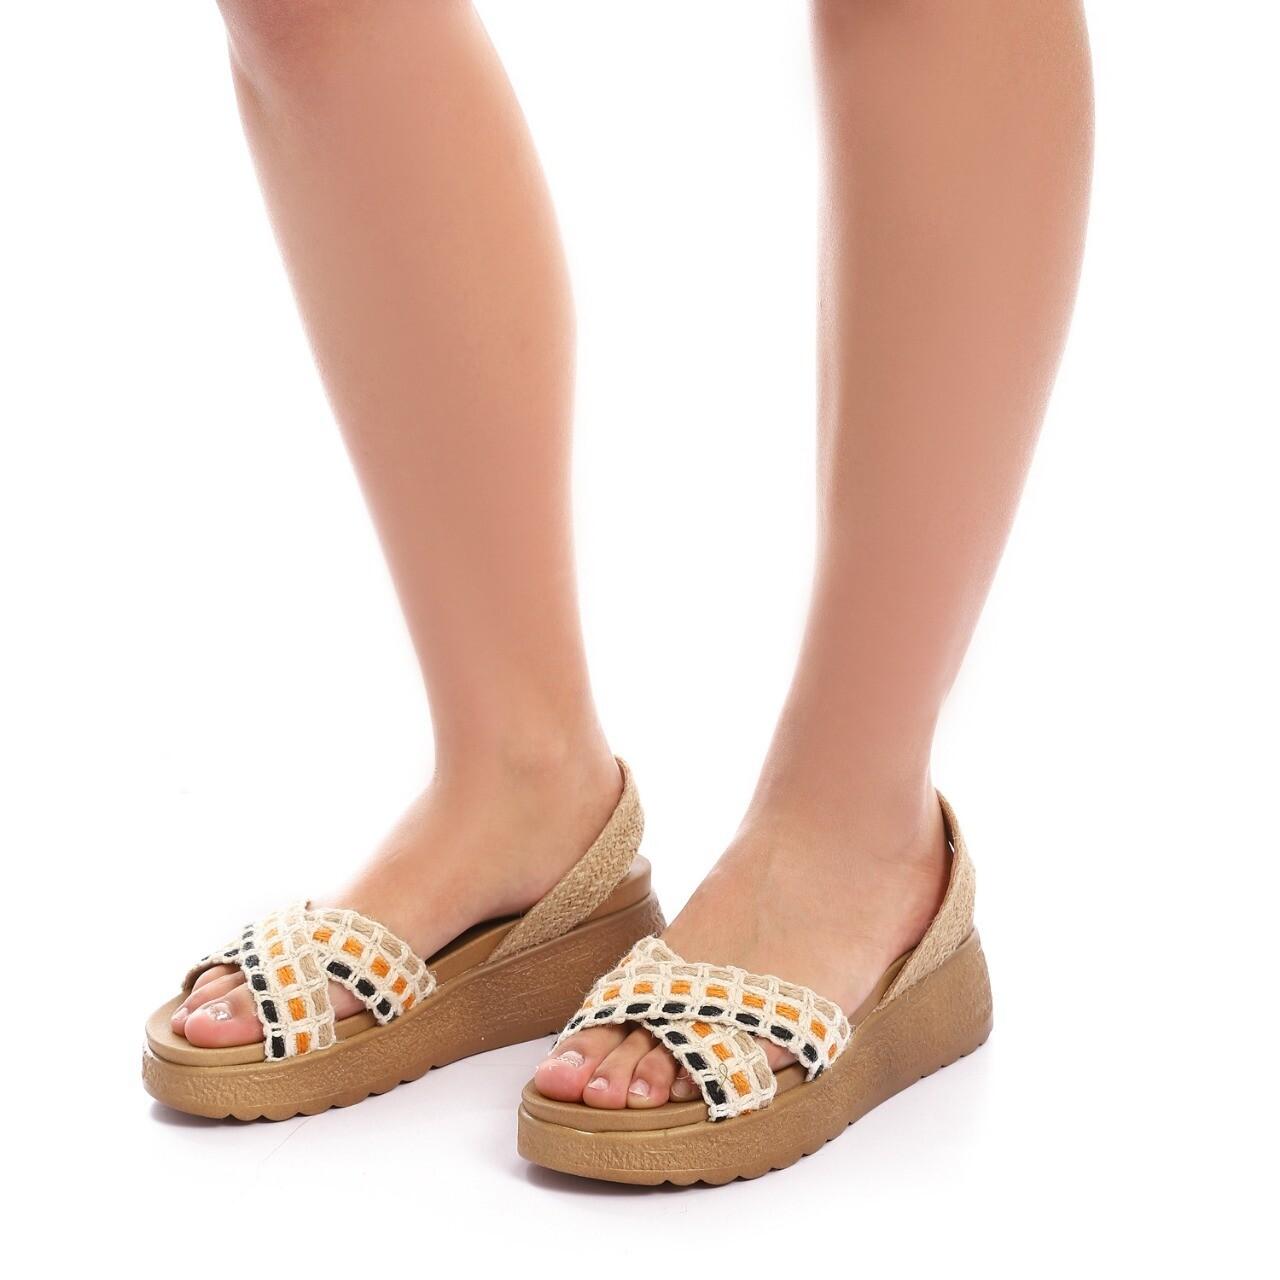 3791 Sandal - Brown